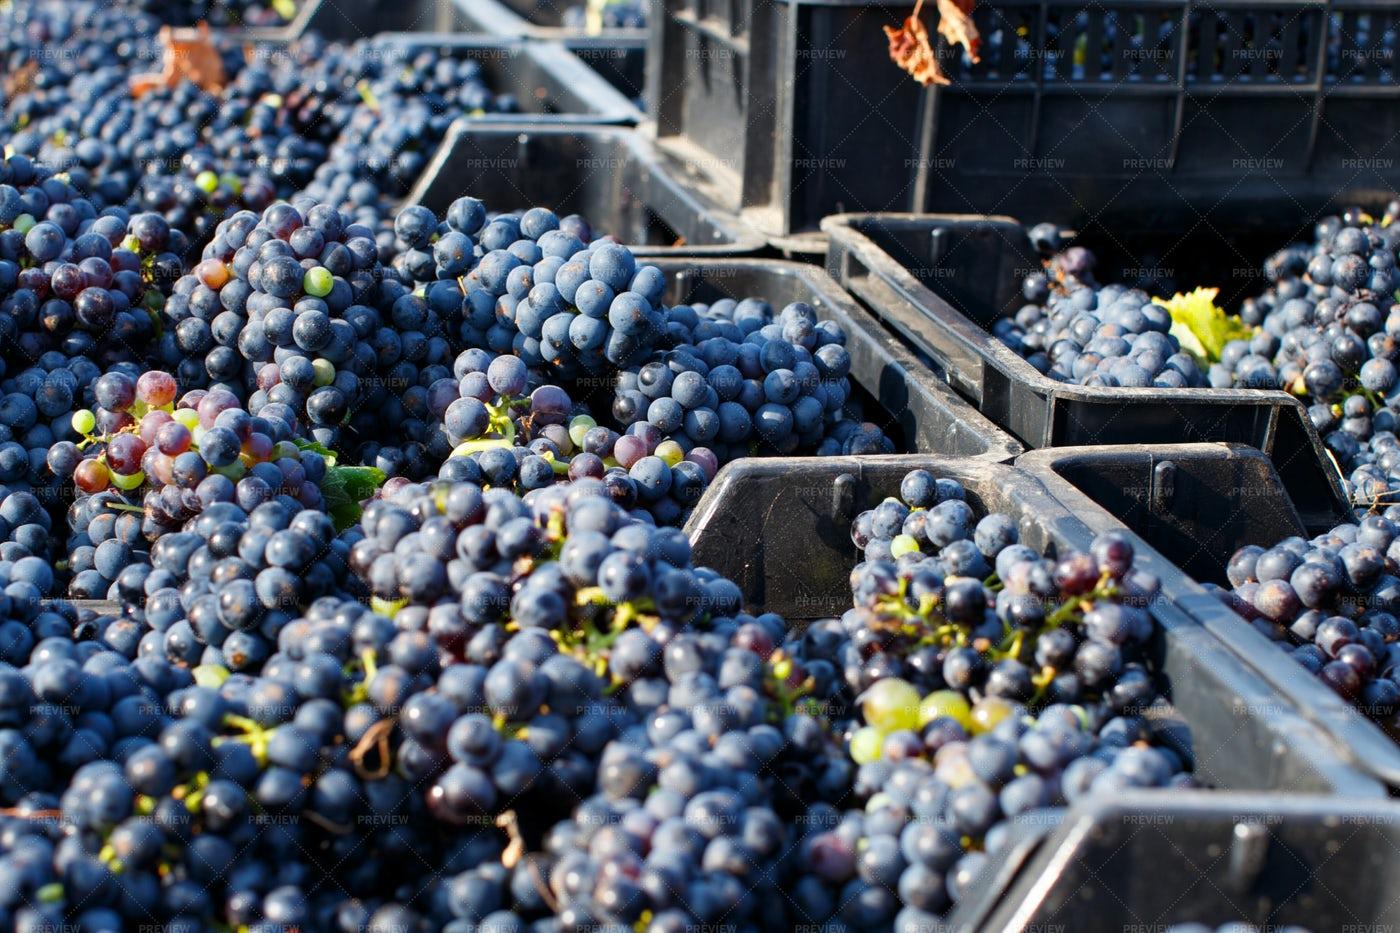 Grapes In Plastic Crates: Stock Photos